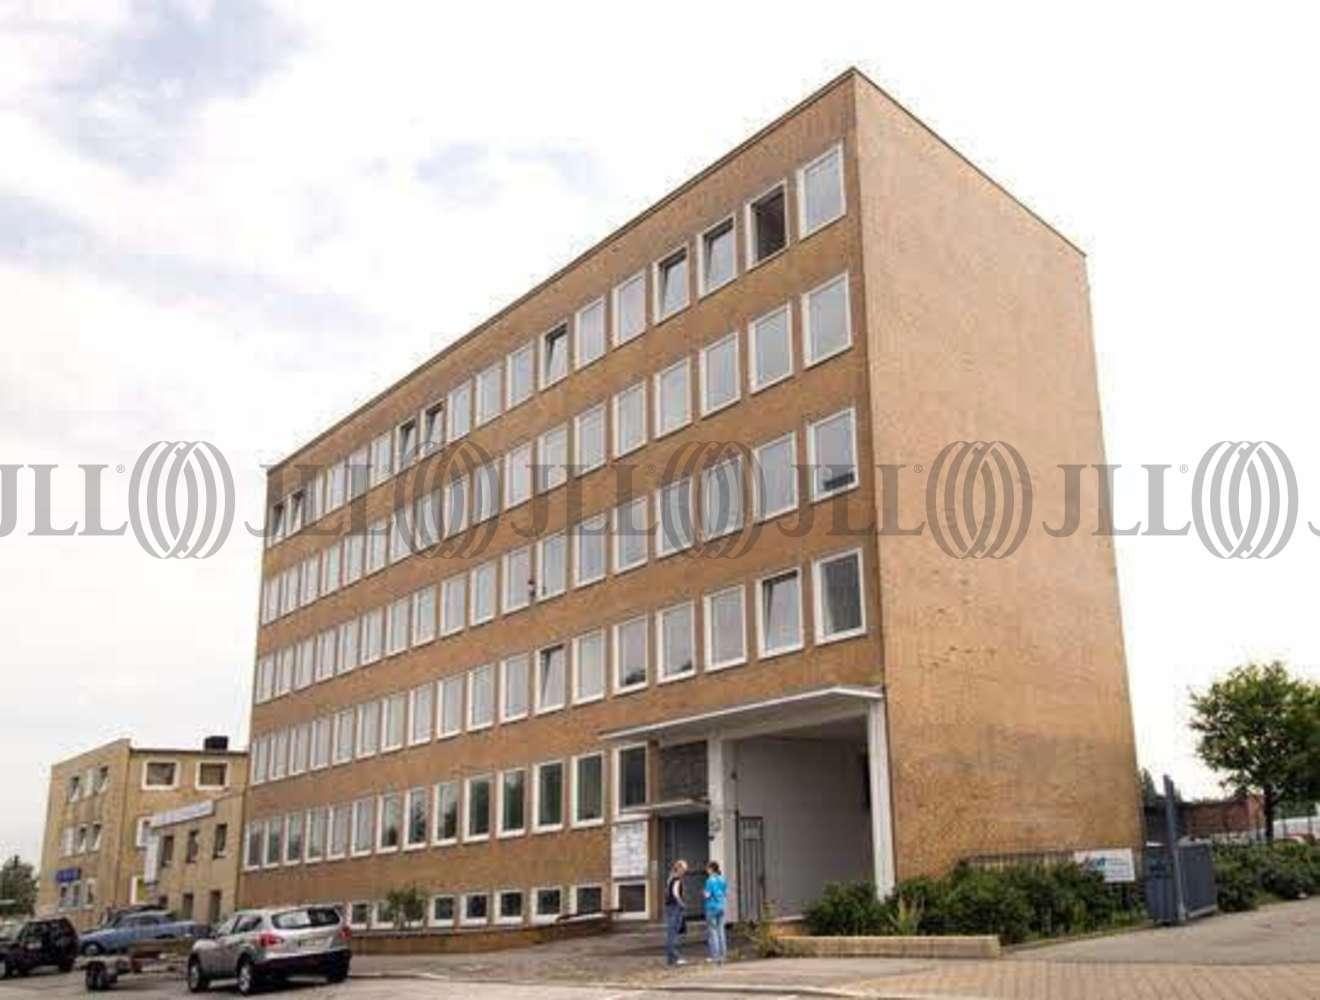 Büros Hamburg, 20537 - Büro - Hamburg, Hammerbrook - H1045 - 9541556